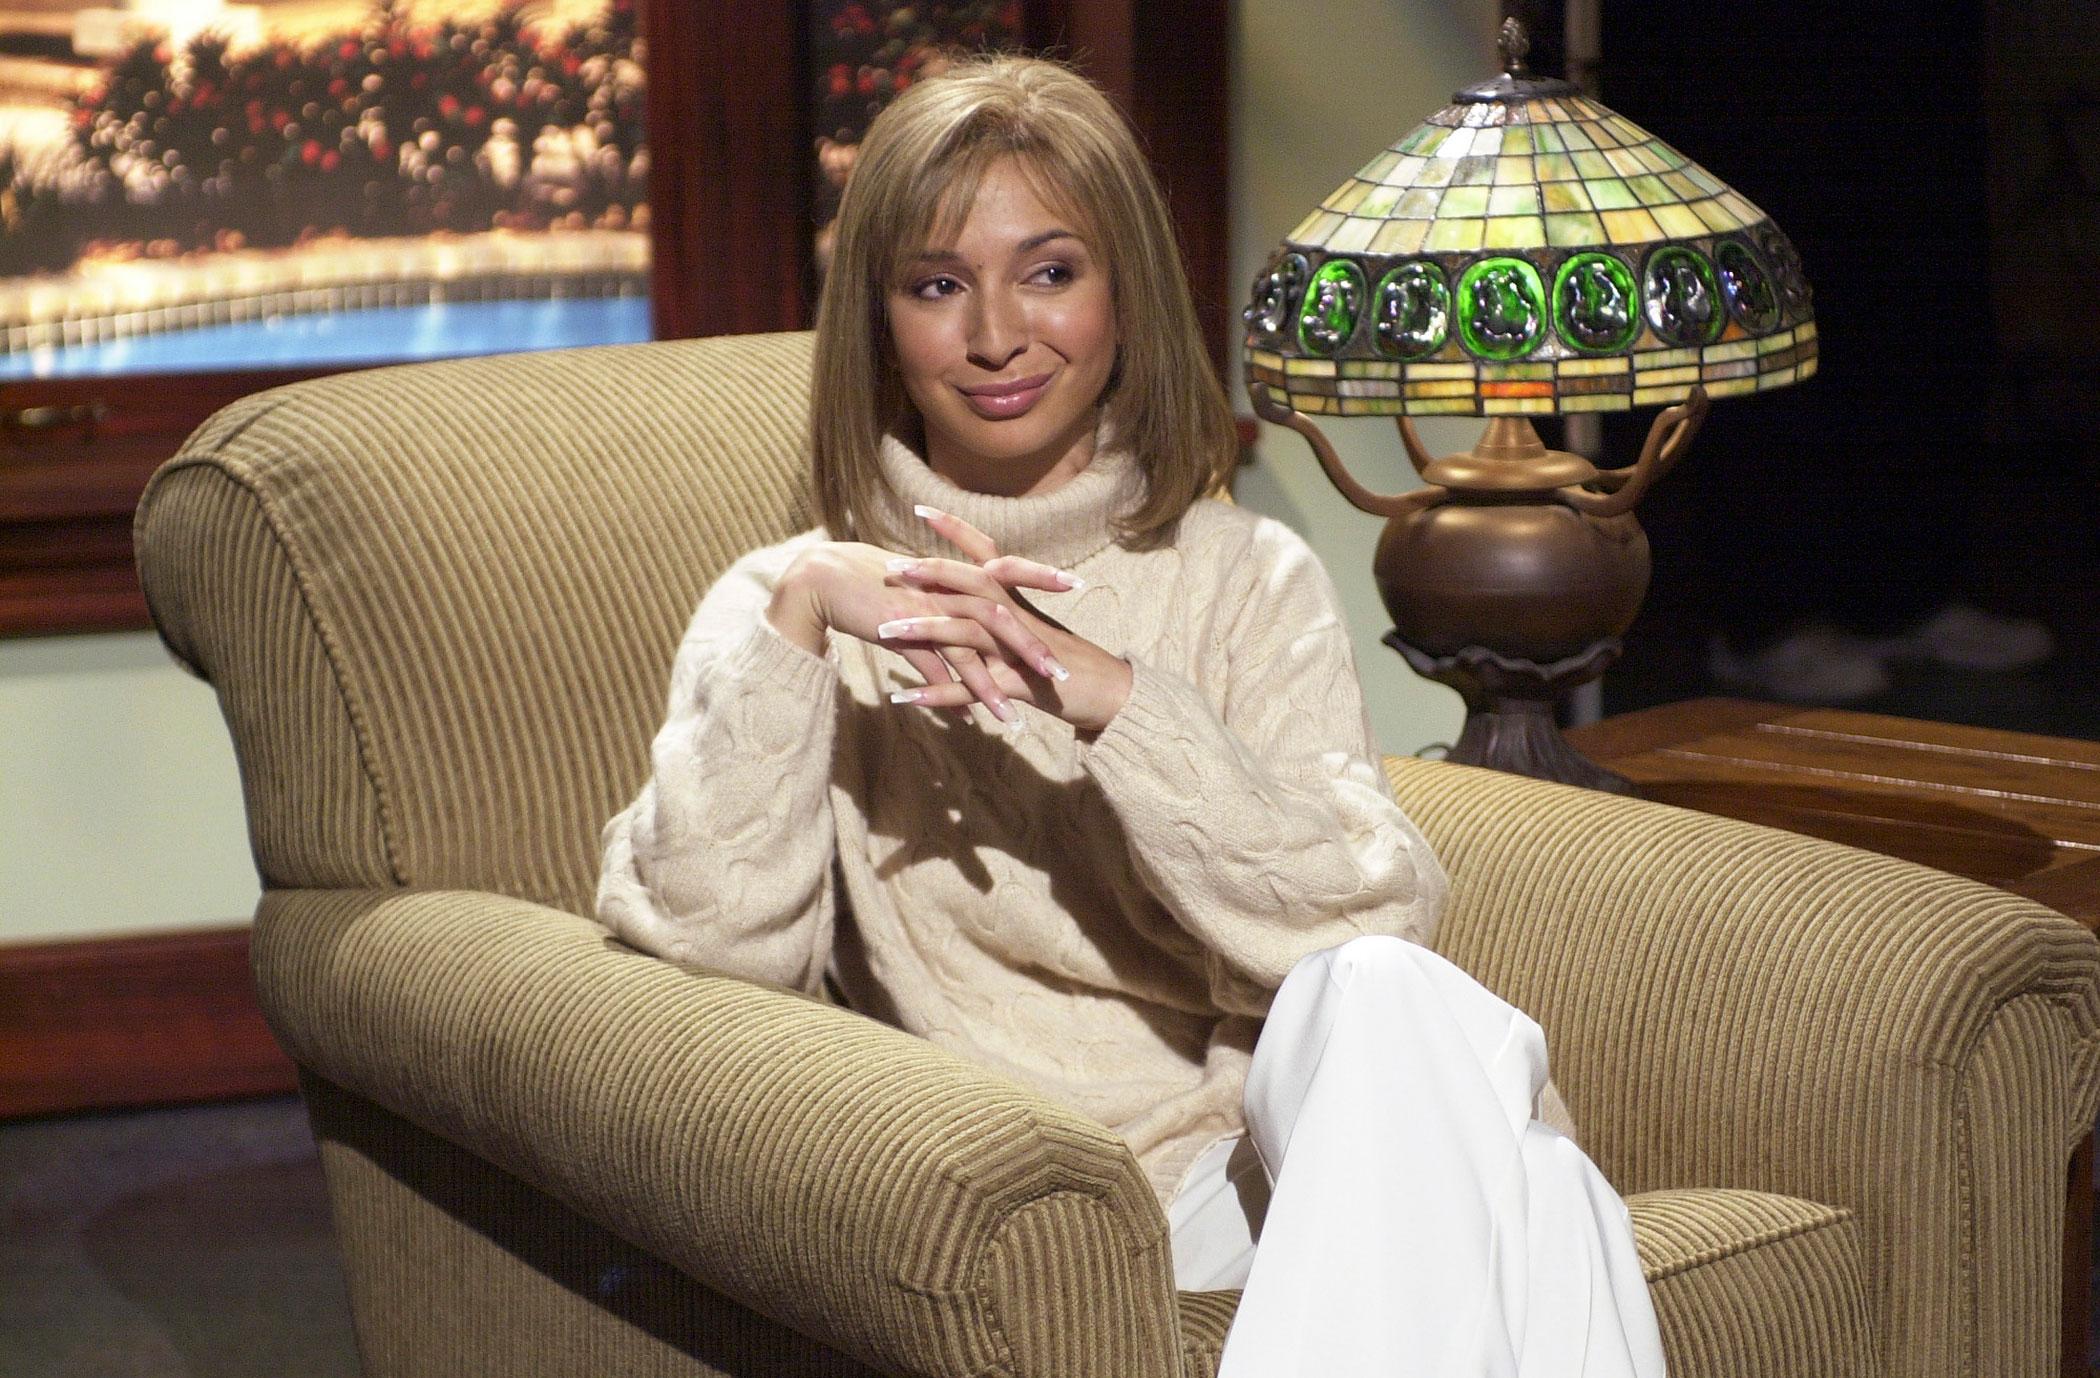 Maya Rudolph as Barbra Streisand during the Donahue skit on Nov. 16, 2002.